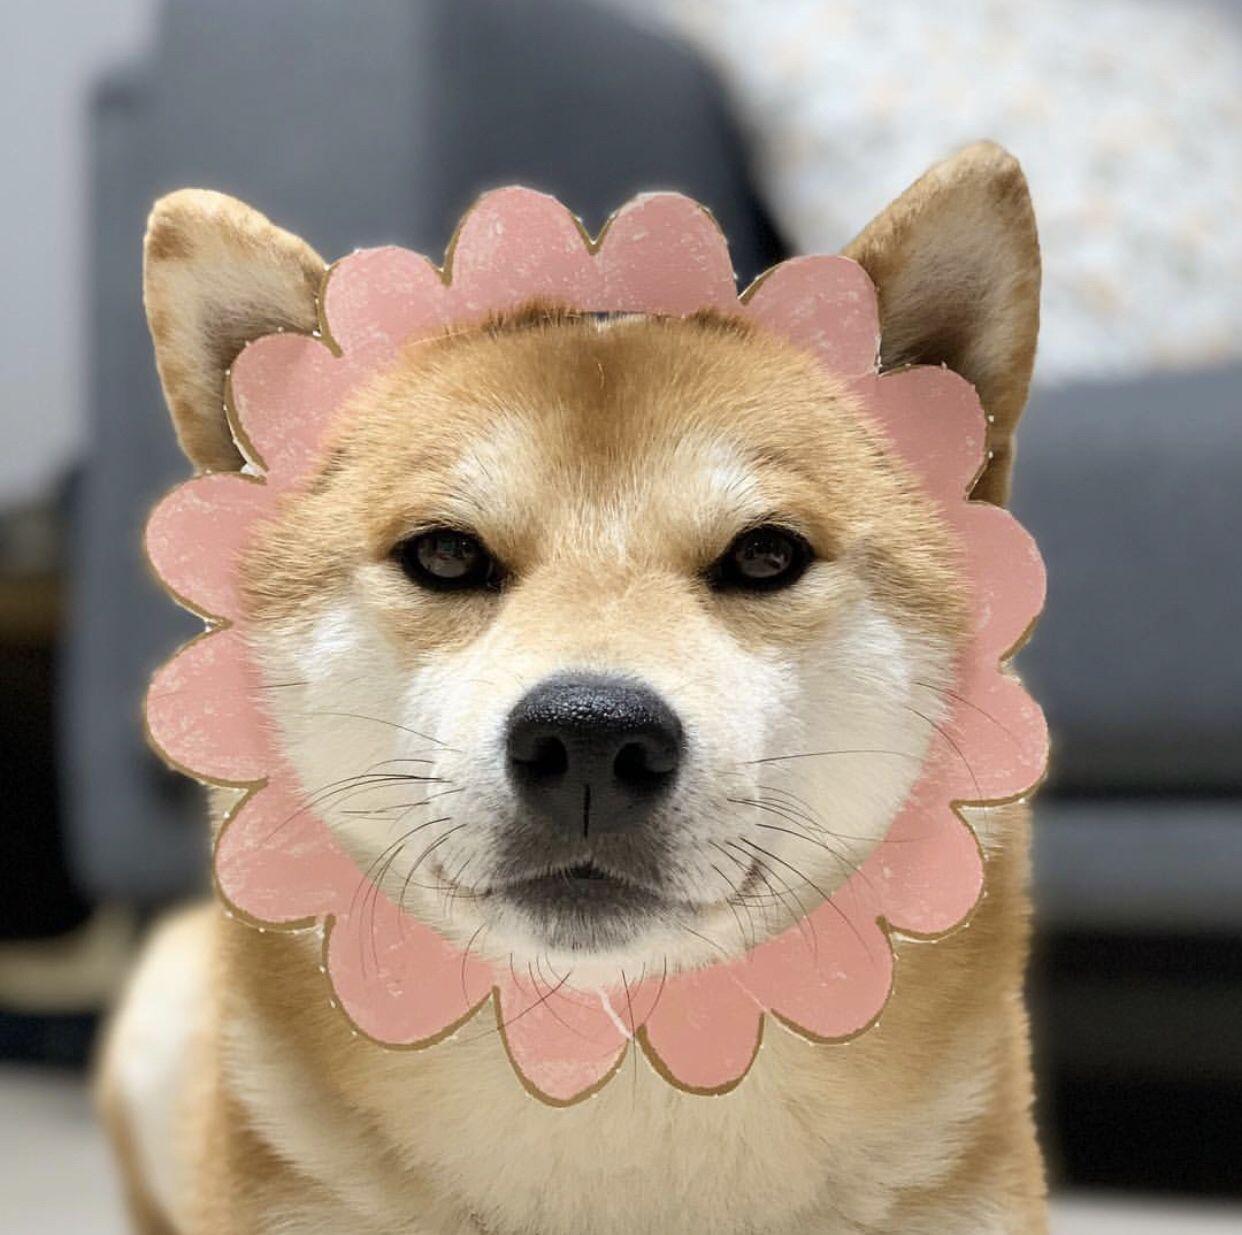 Shiba Shibainu Shibadog Funny Cute Adorable Cuteanimals